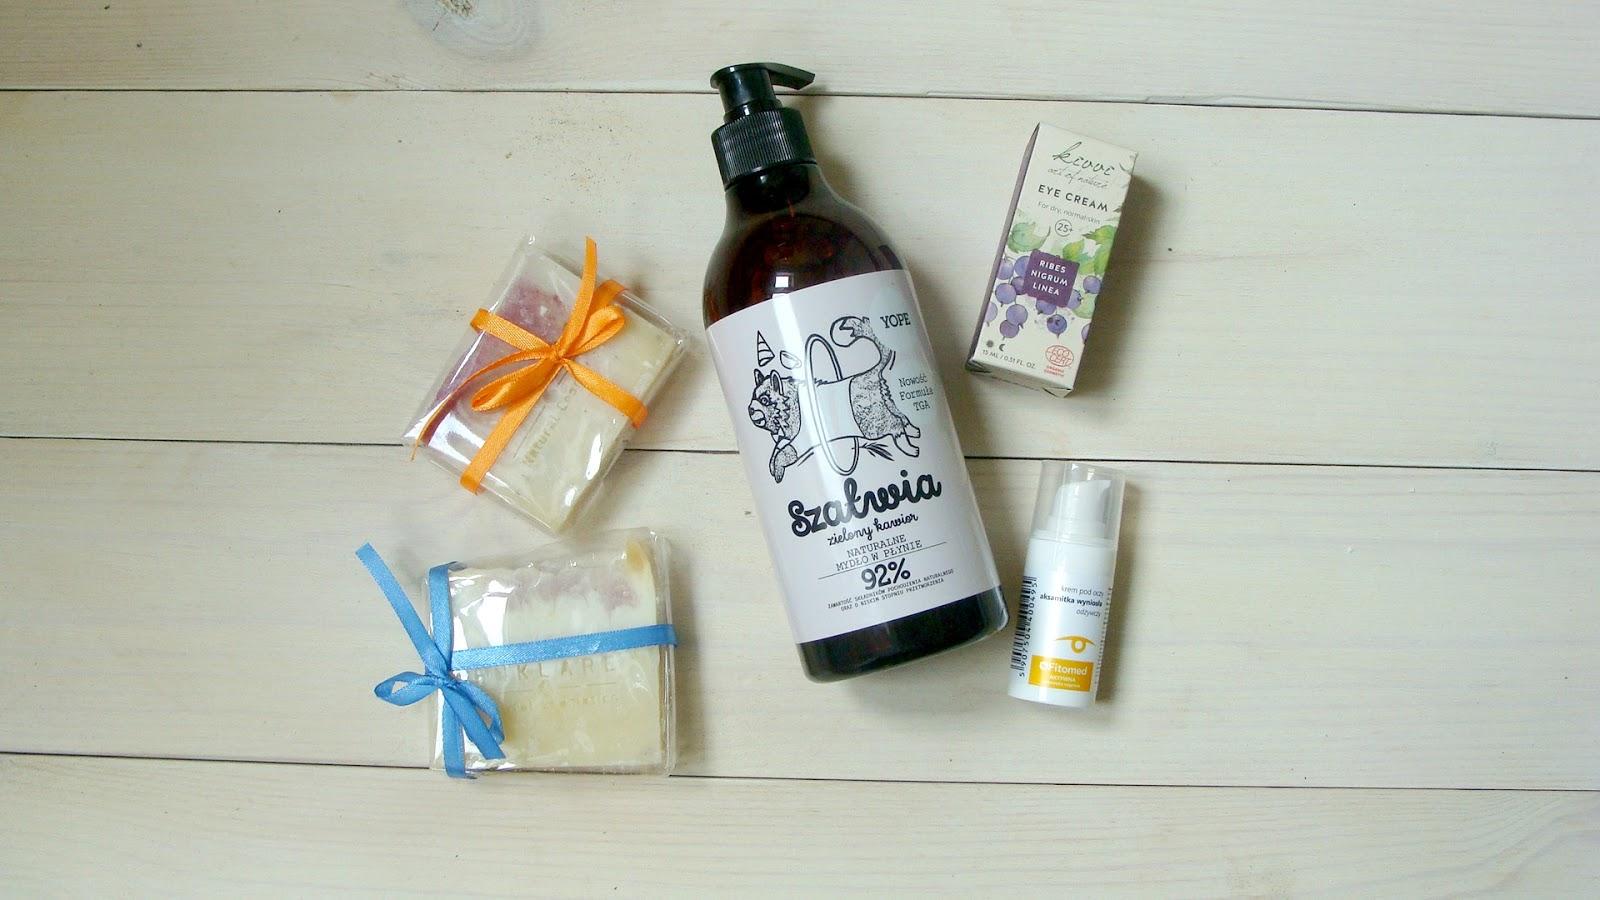 Kosmetyki naturalne, które warto poznać, kivvi, yope, enklare, fitomed